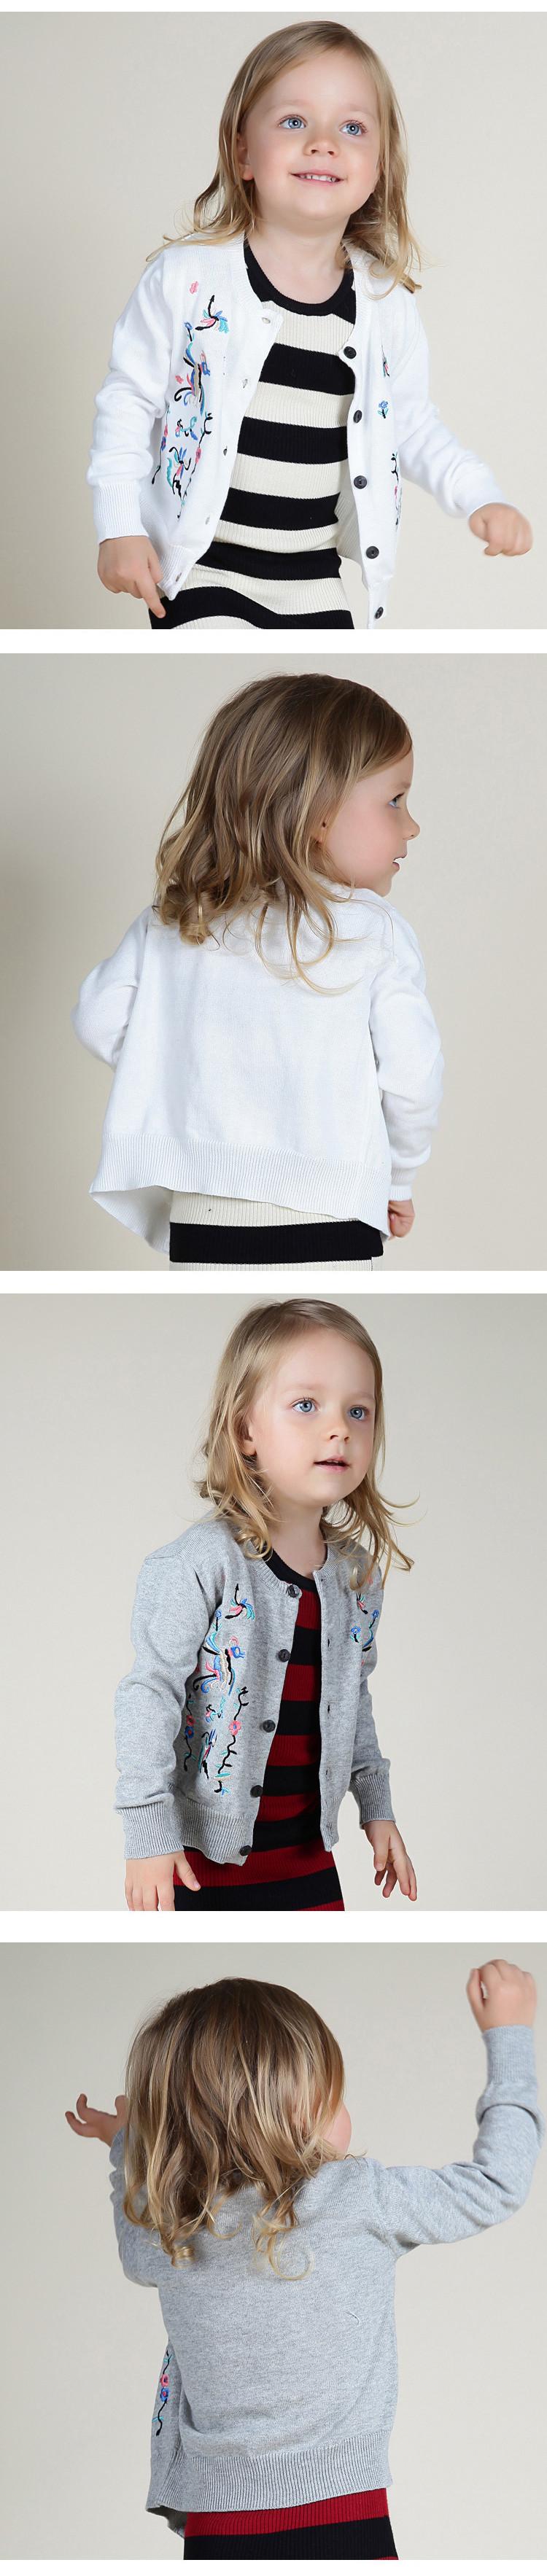 girls clothing-5